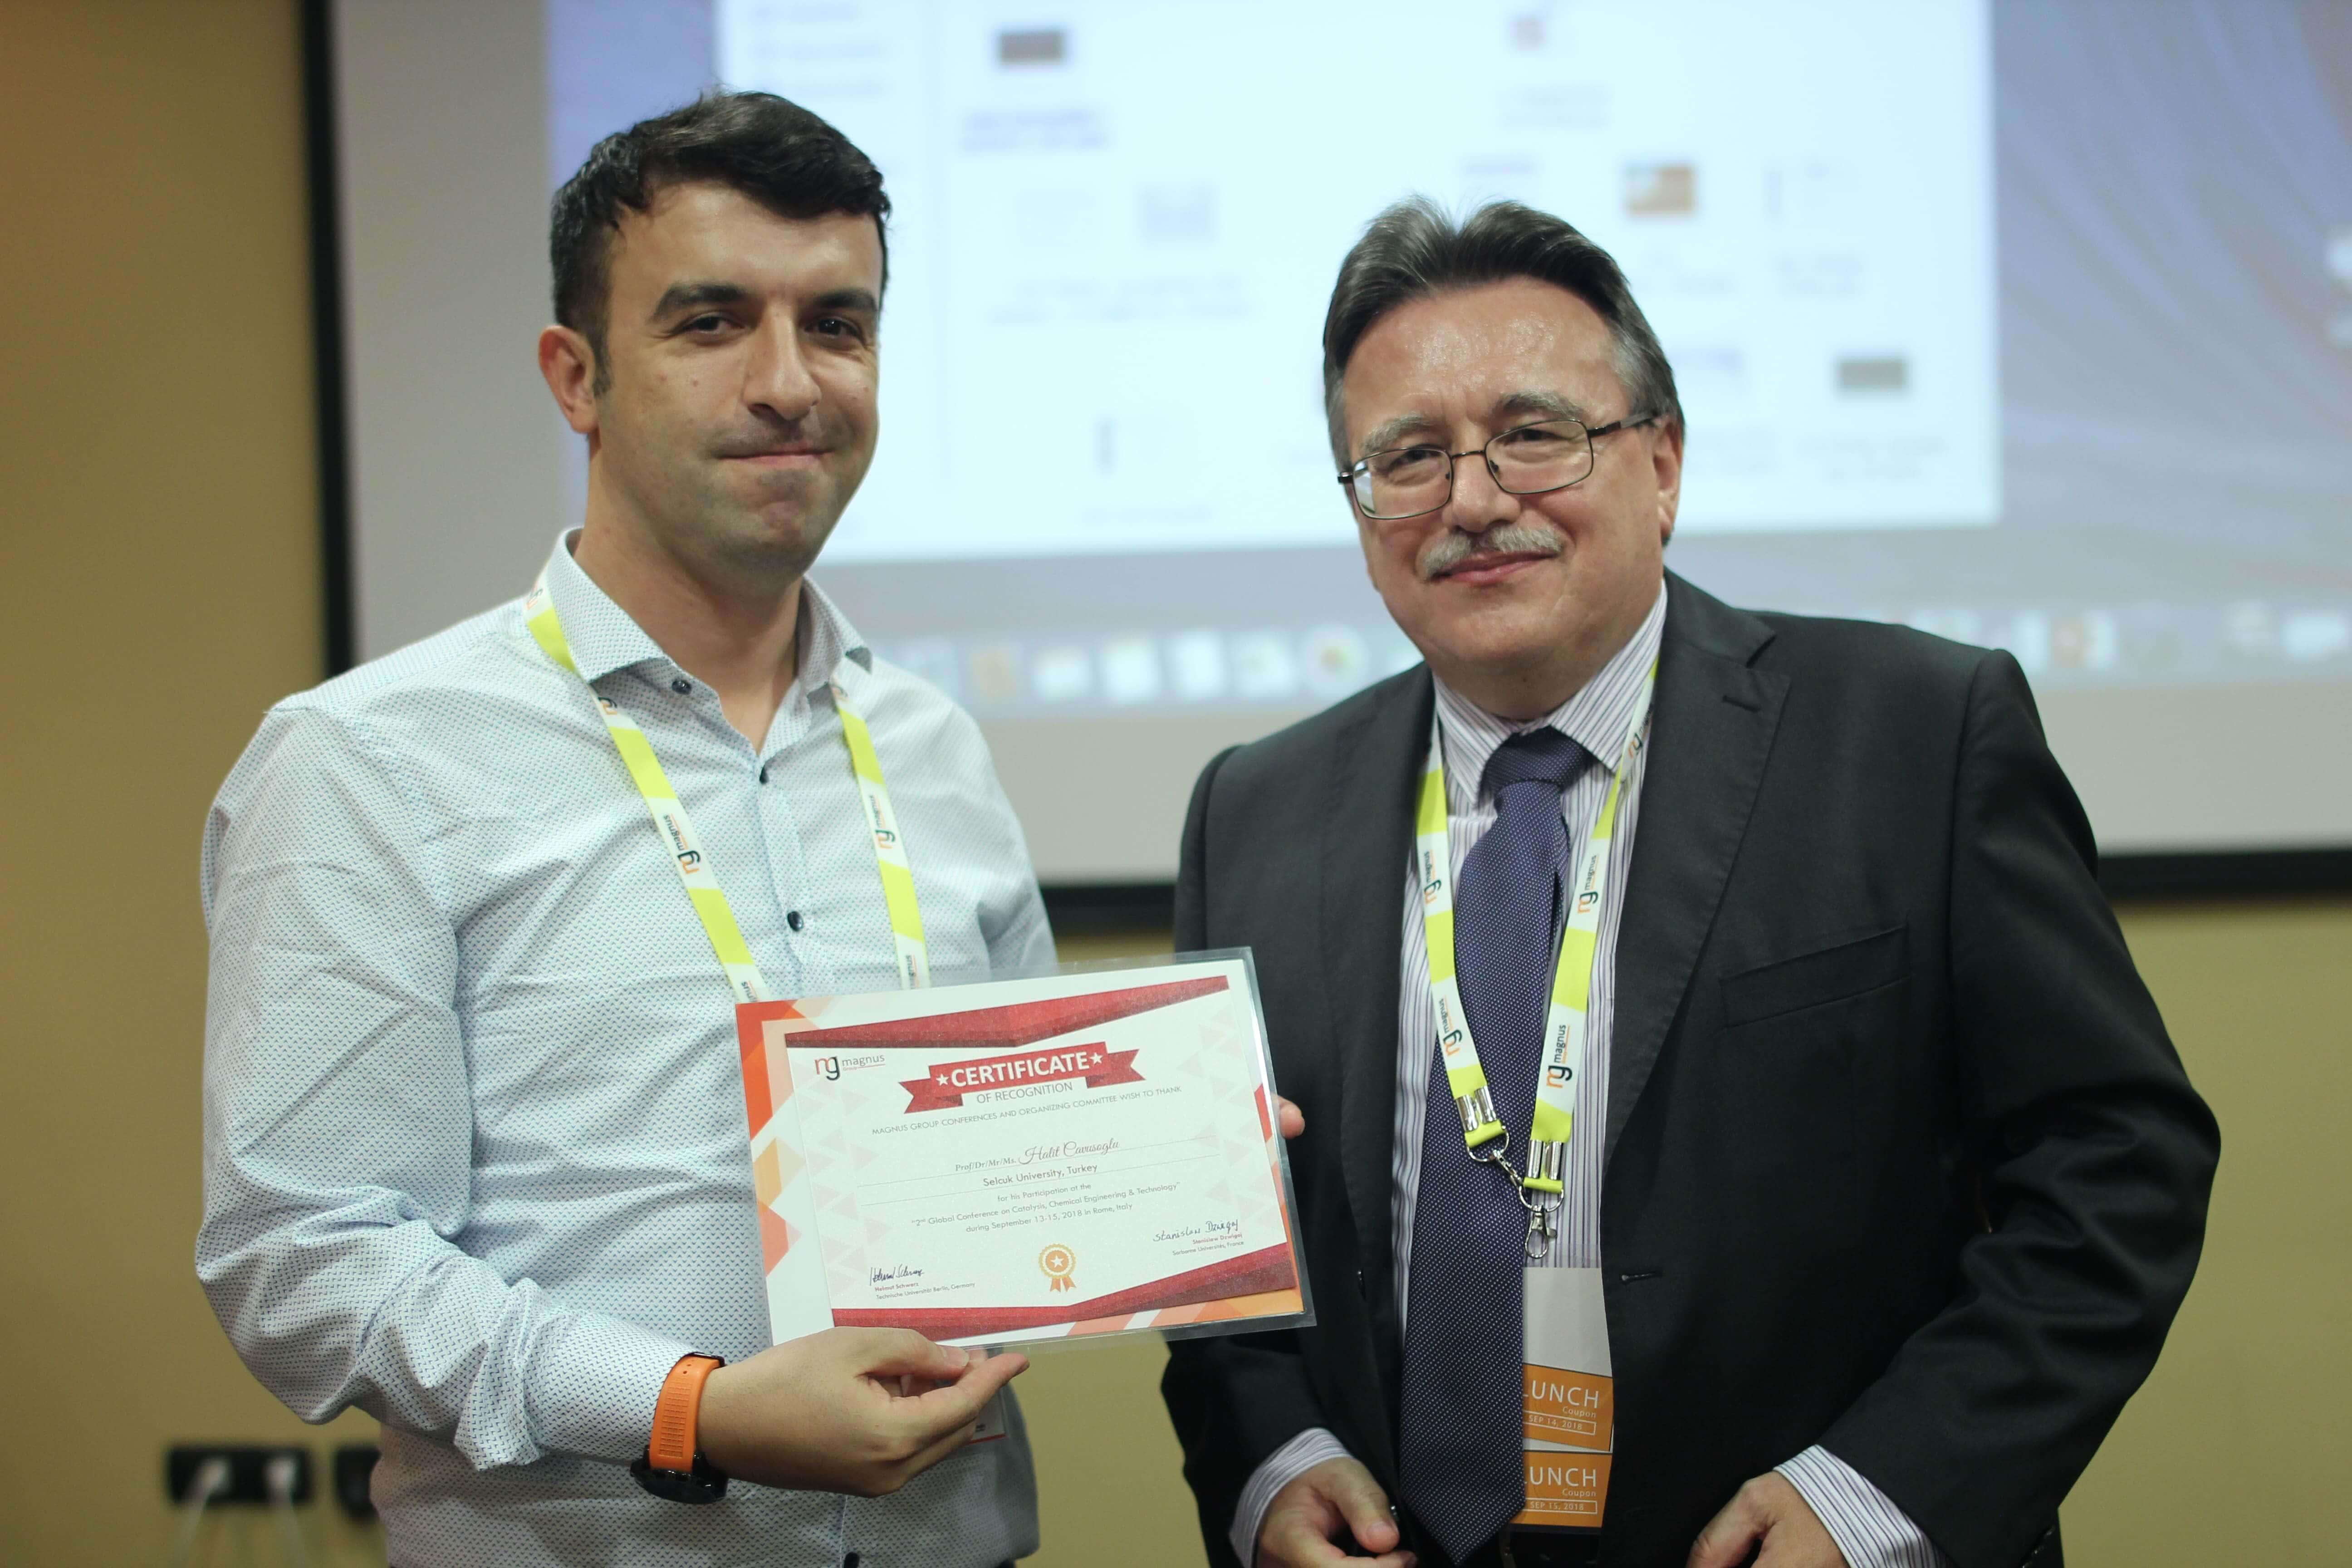 Halit Cavusoglu felicitated by Jan Cermak